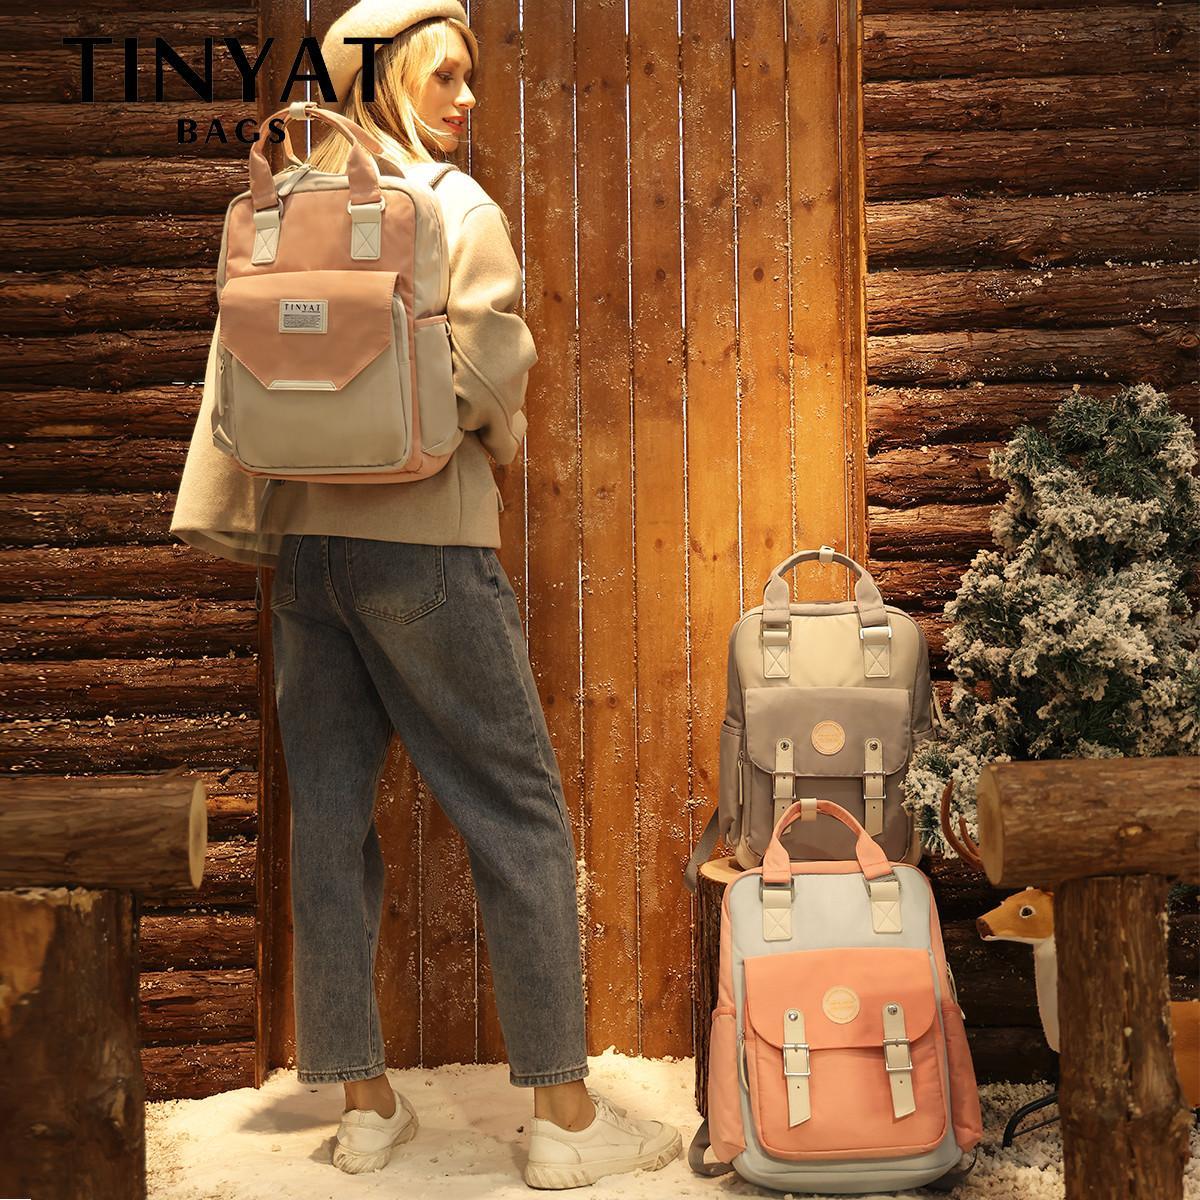 TINYAT Candy women canvas waterproof feminina laptop backpack 15 Pink Patchwork school backpacks bags for teenage girls Q0112